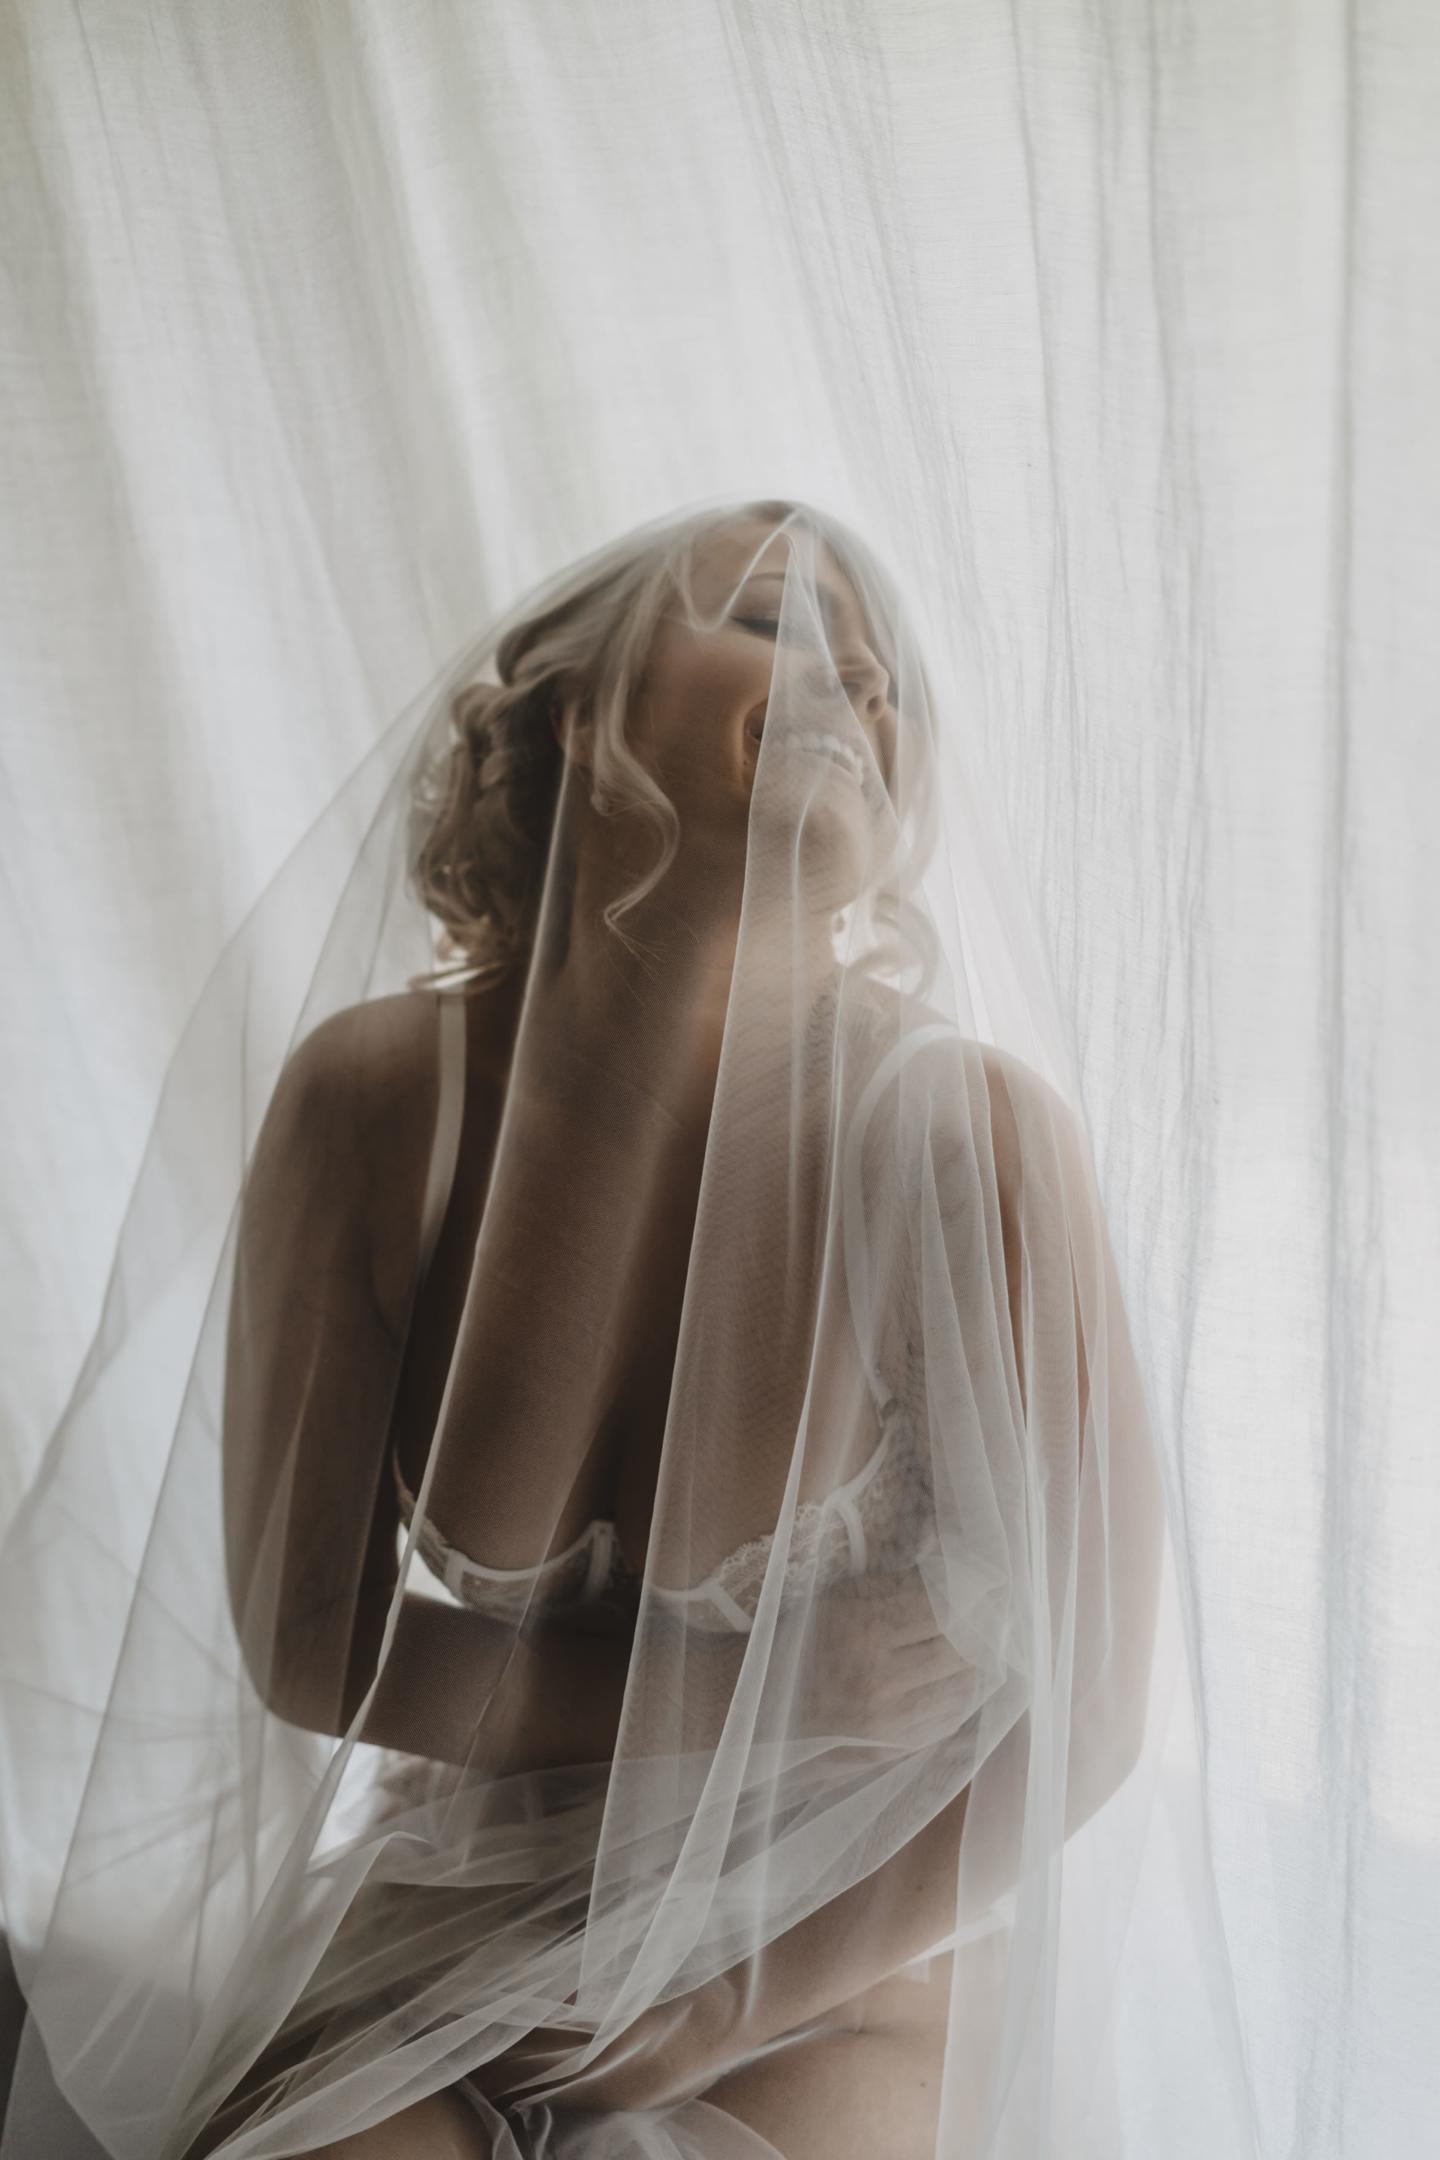 Bride portrait: when beauty comes from happiness :: Bride's portrait: when beauty comes from happiness :: Luxury wedding photography - 1 :: Bride portrait: when beauty comes from happiness